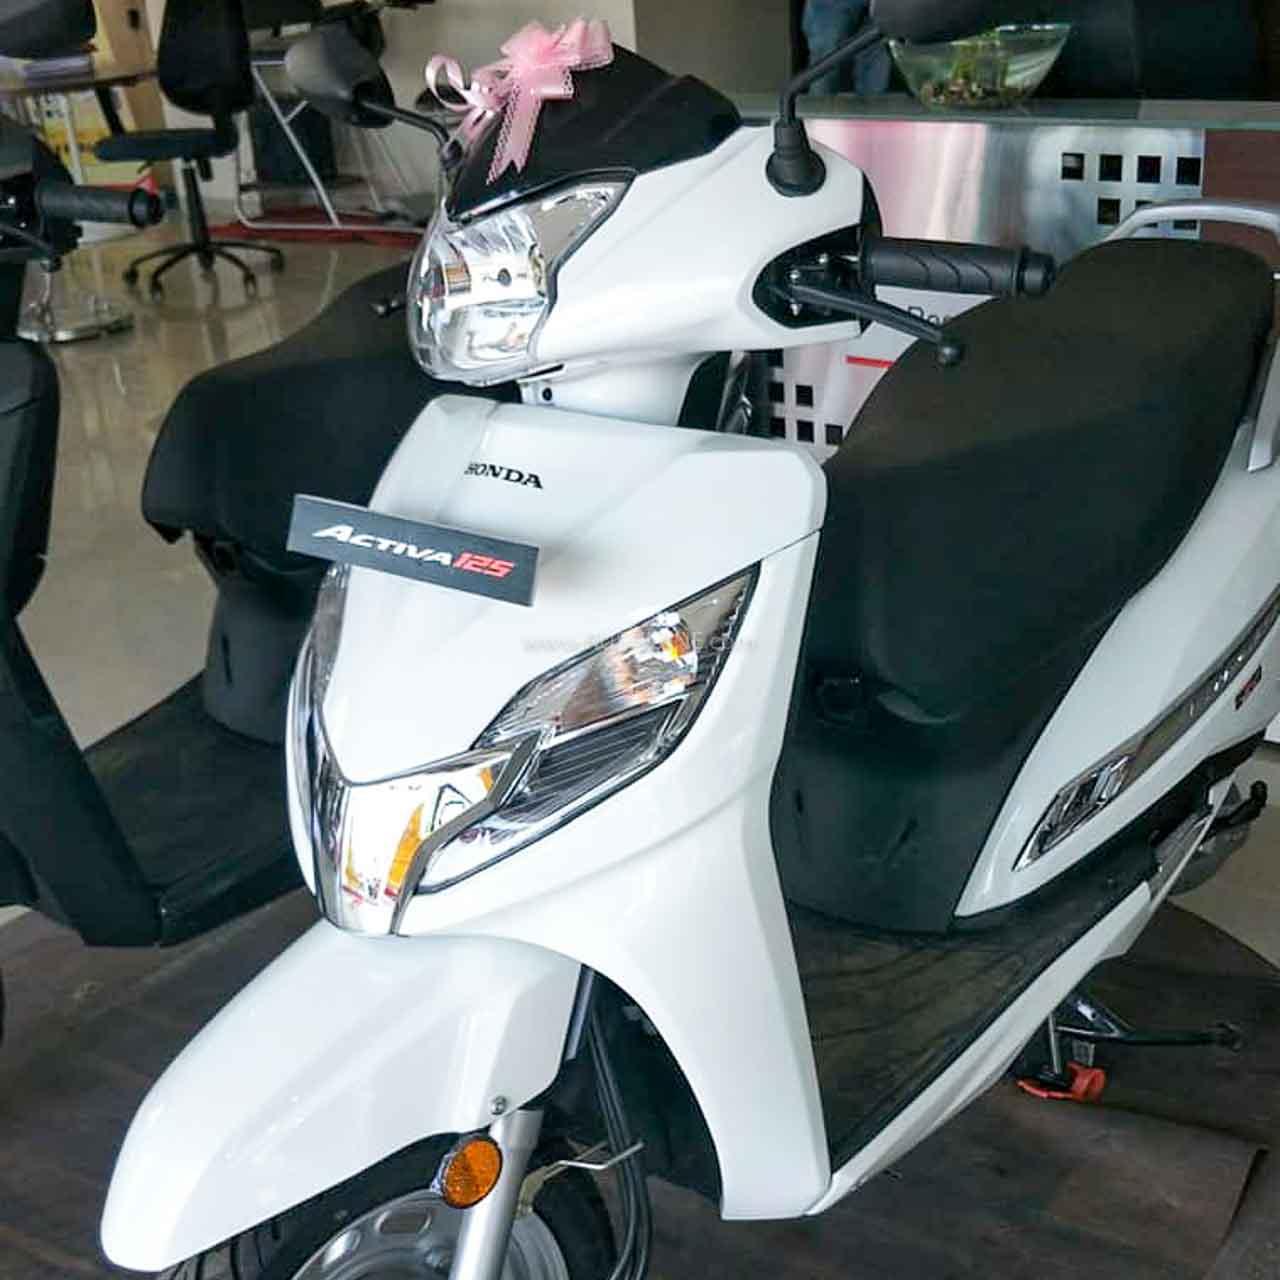 Bs6 Honda Activa 125 Dio And Unicorn 160 Prices Increased New Price List